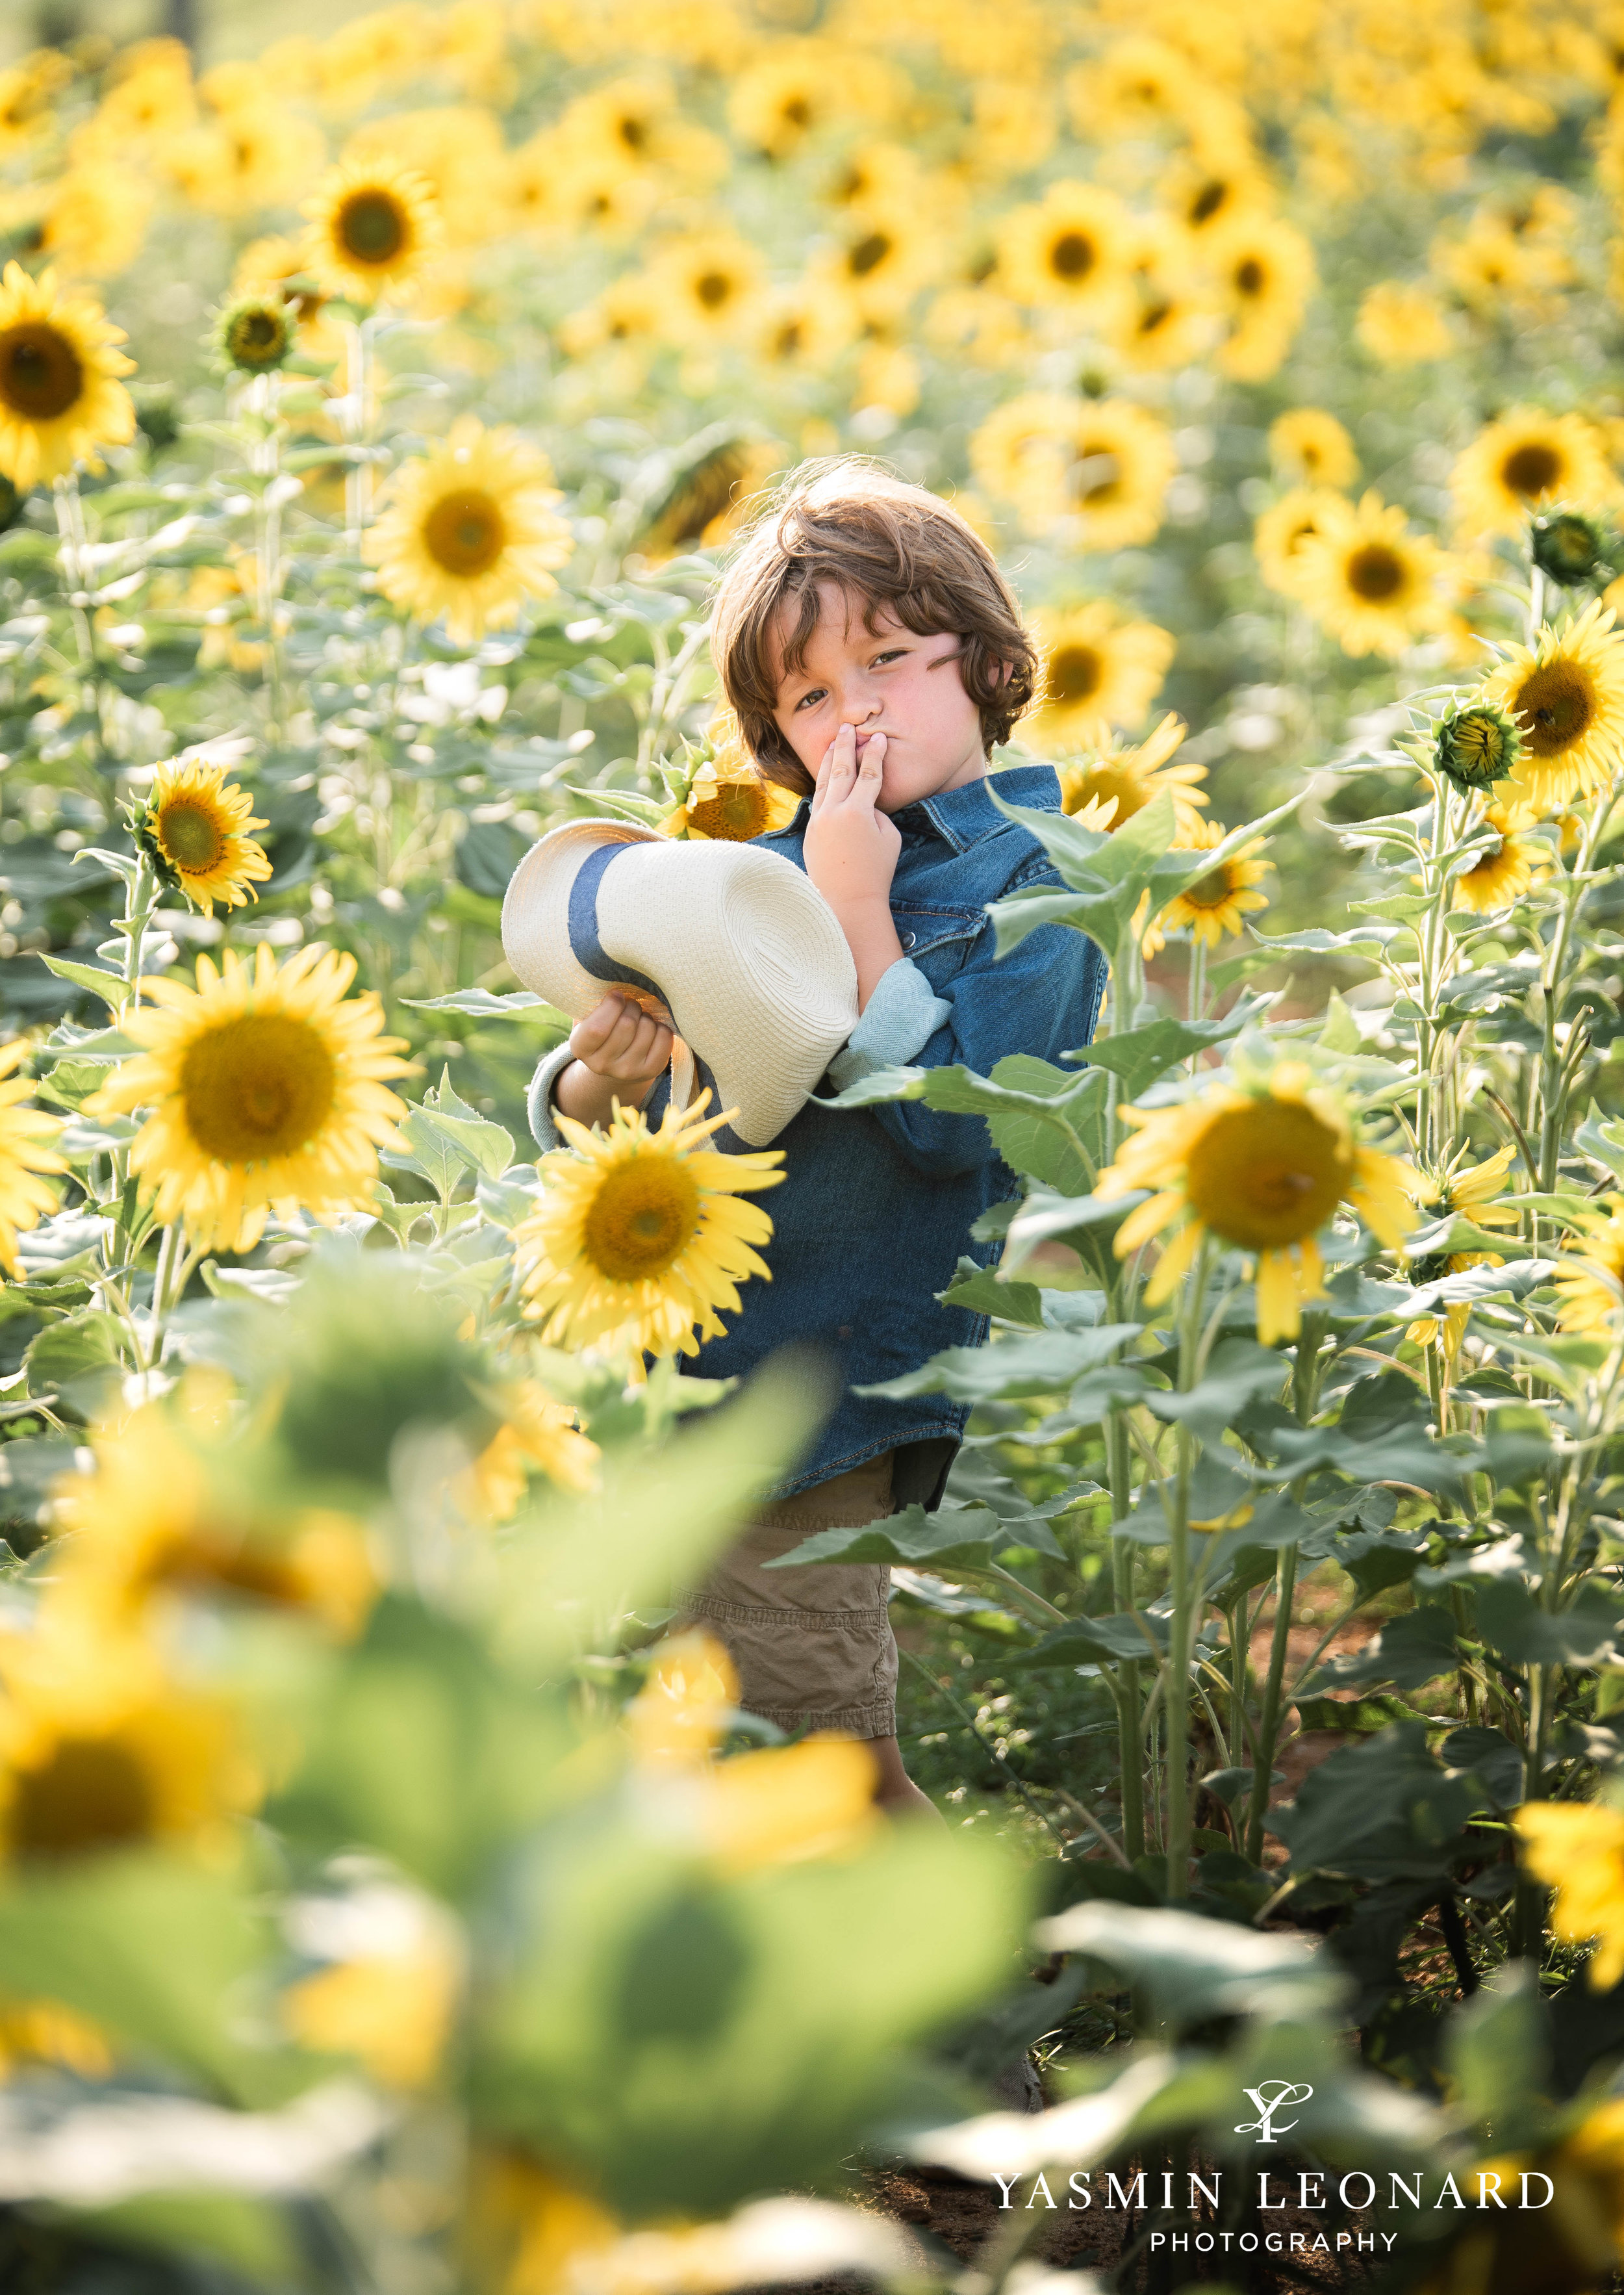 Sunflower Mini Session - Dogwood Farms - Sunflower Field - Boys in Sunflower Field - What to wear sunflower field - Yasmin Leonard Photography-6.jpg